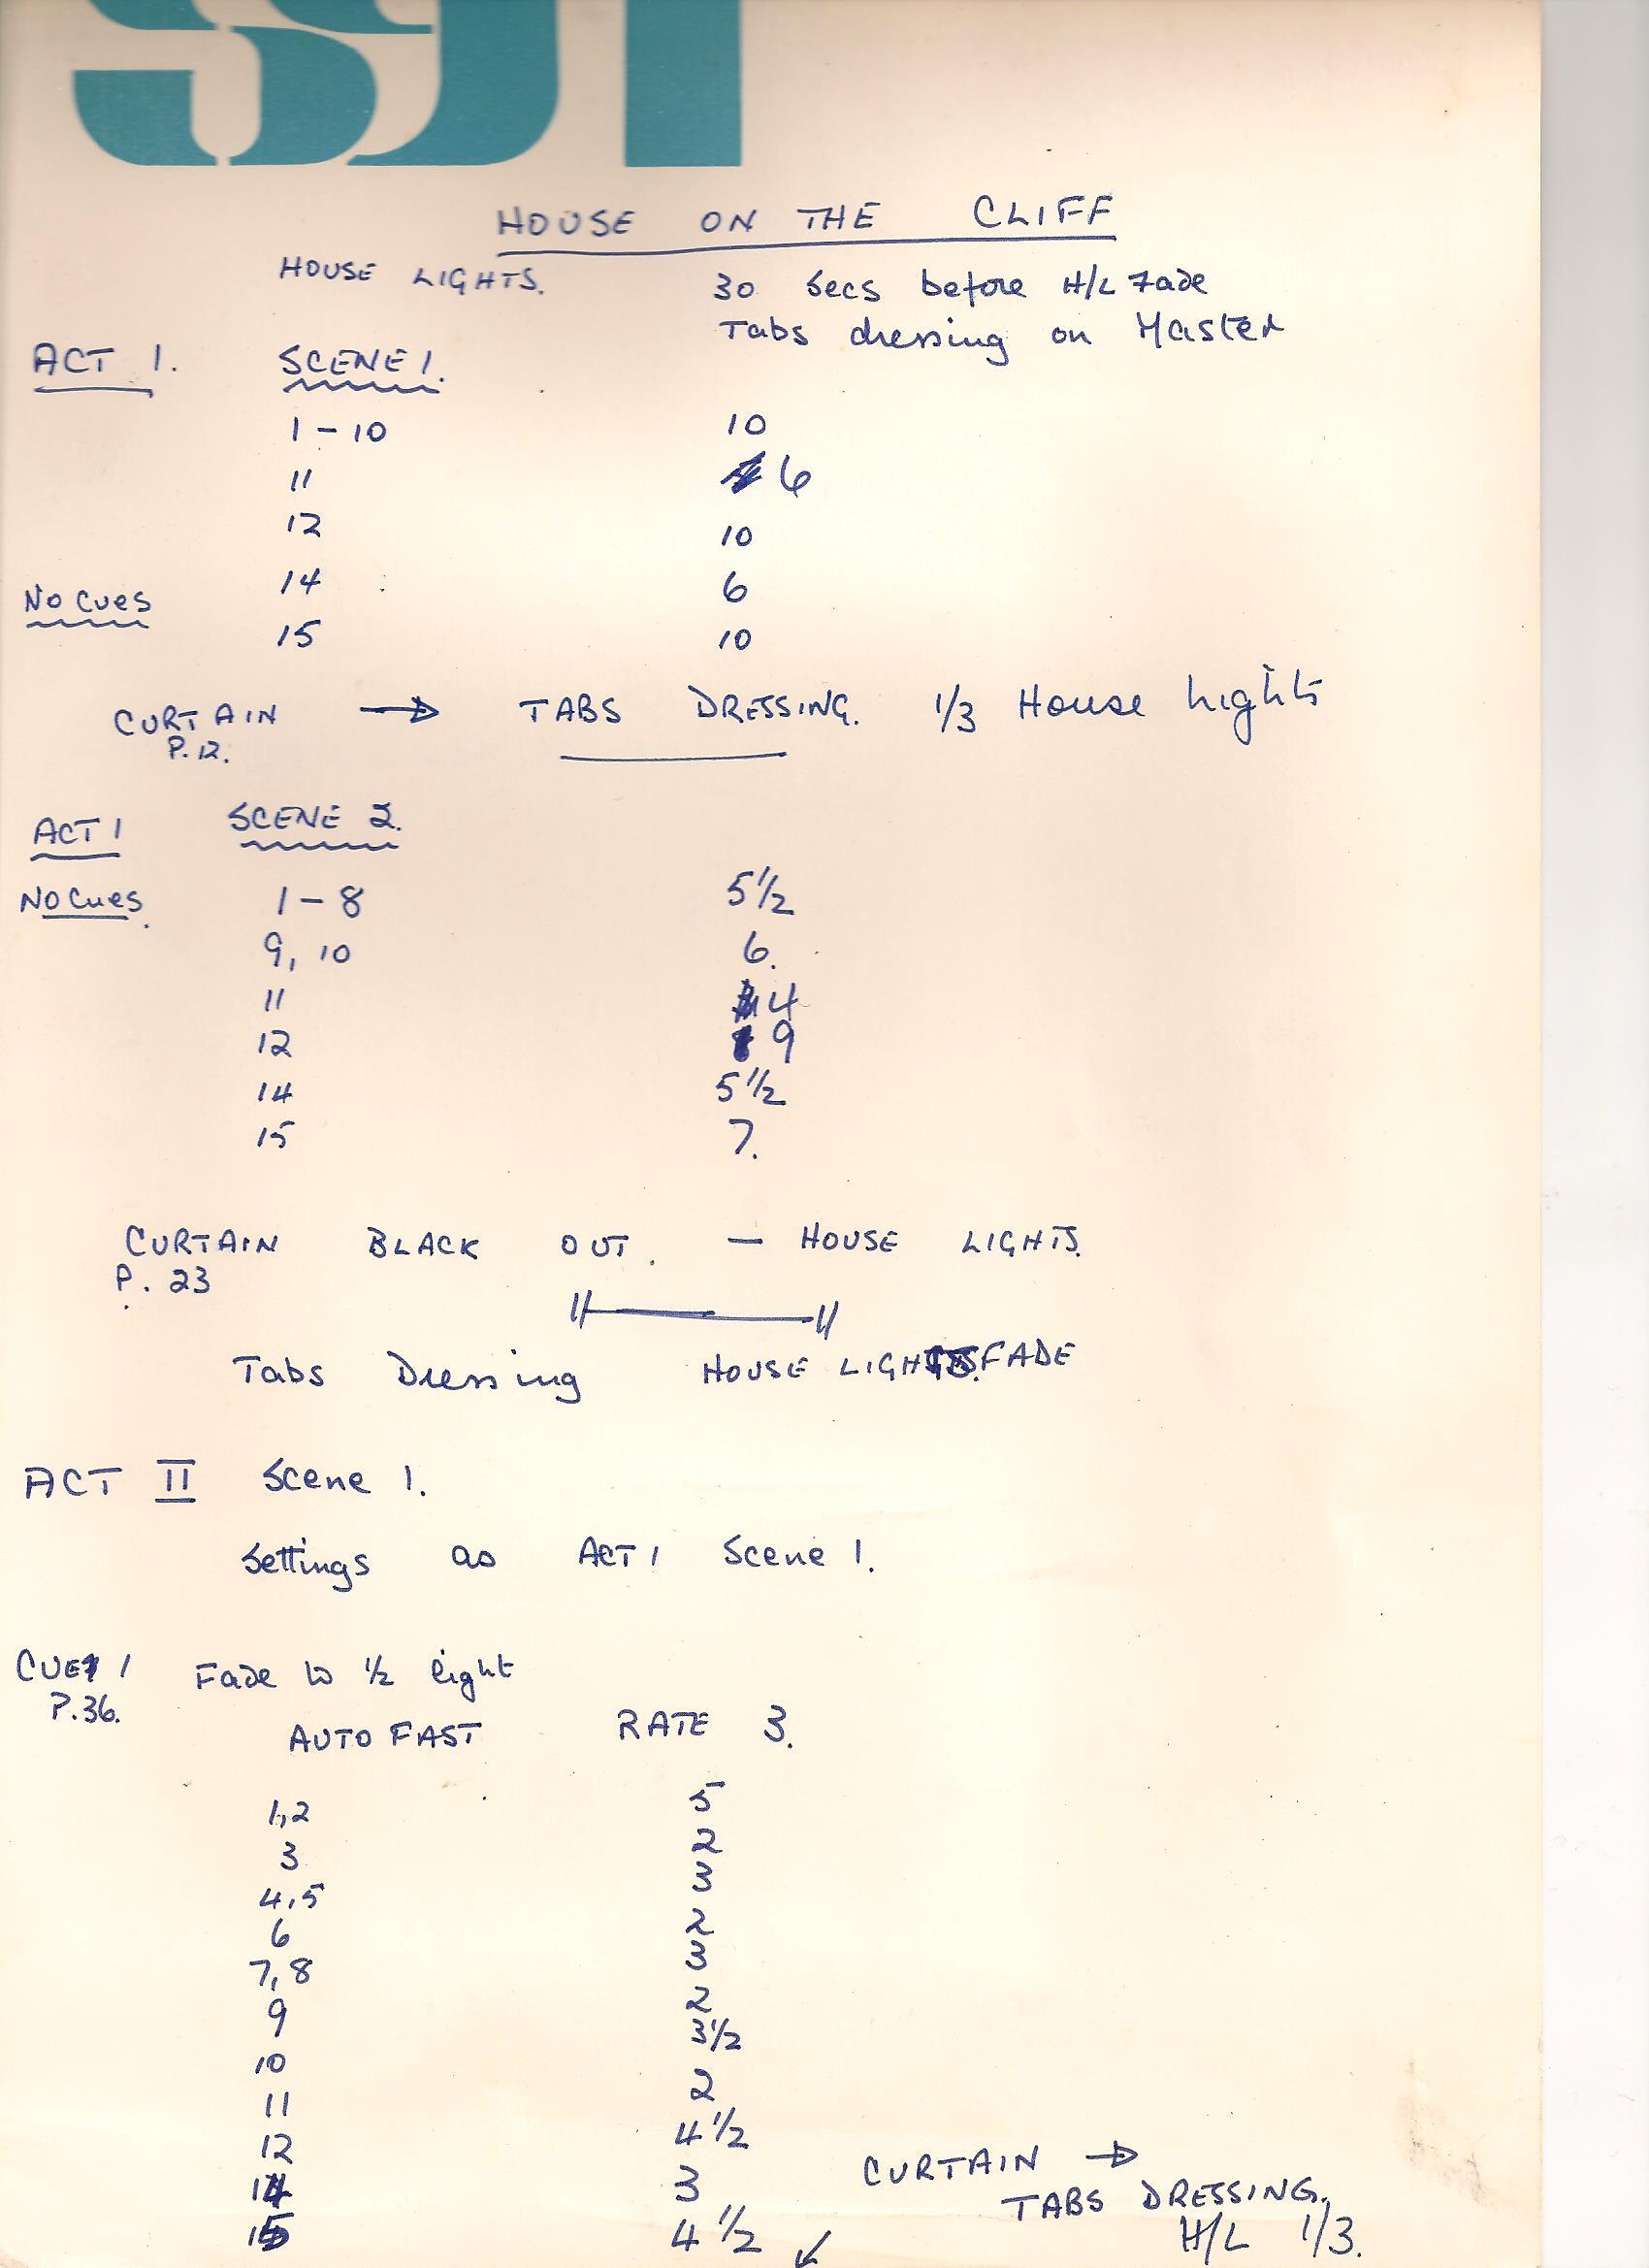 SM's cue sheet 1